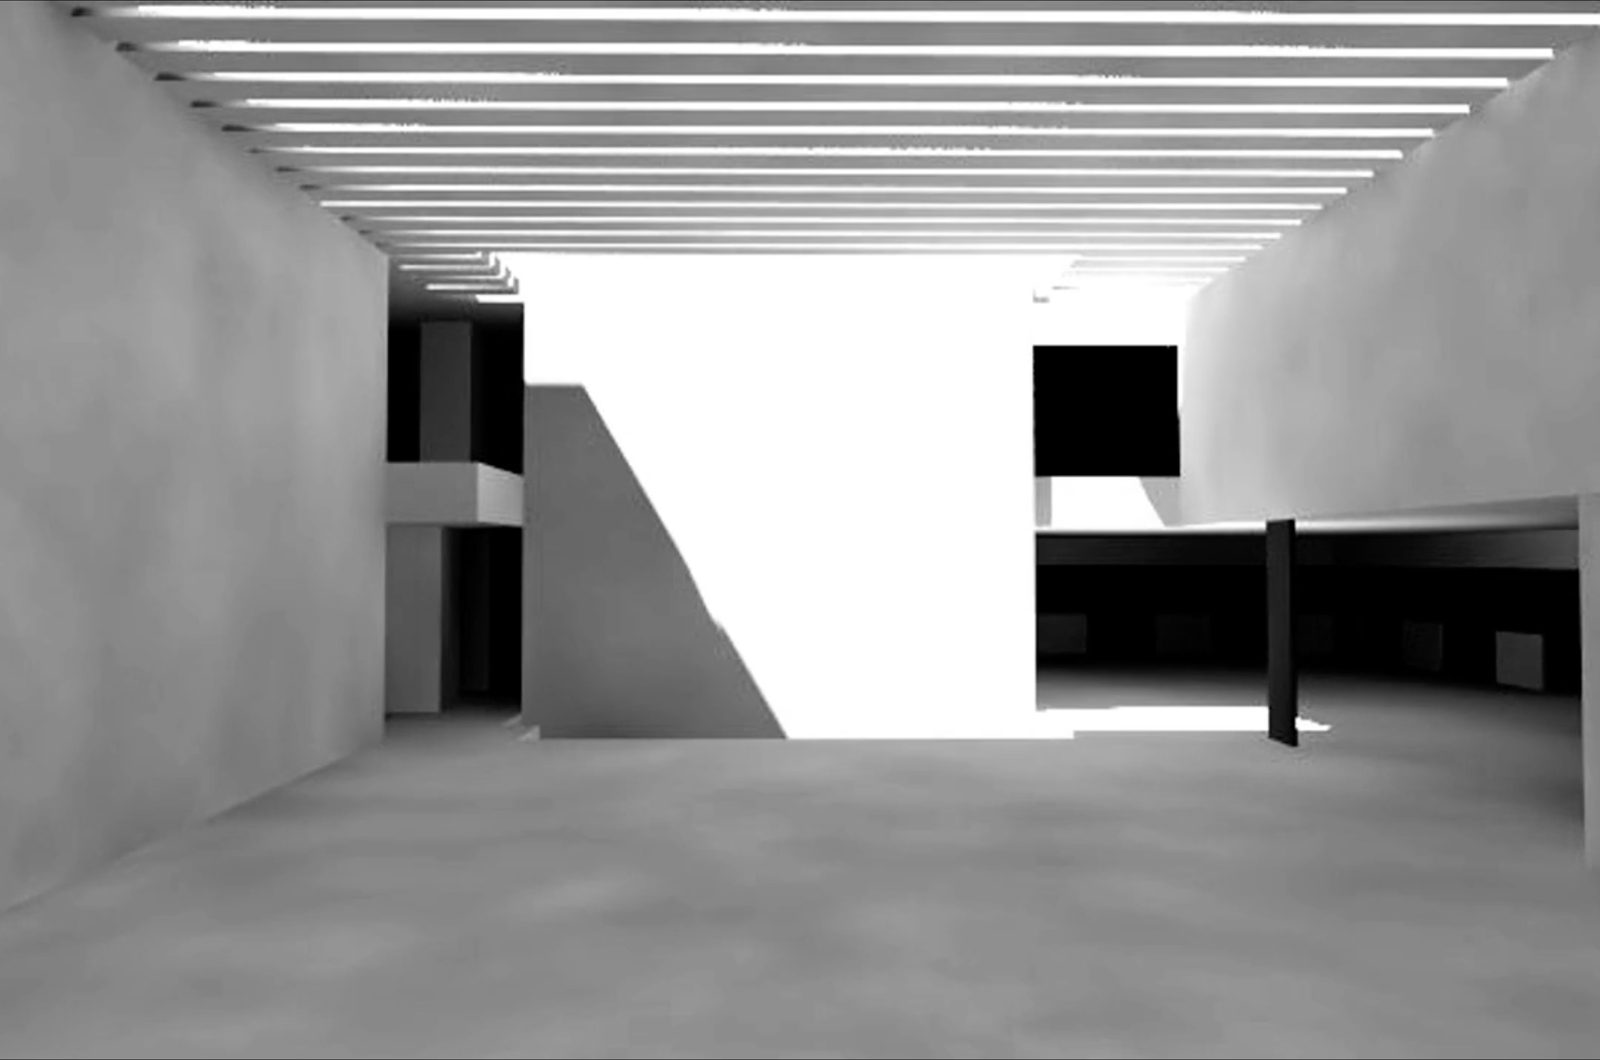 NIC Natural Light Simulation